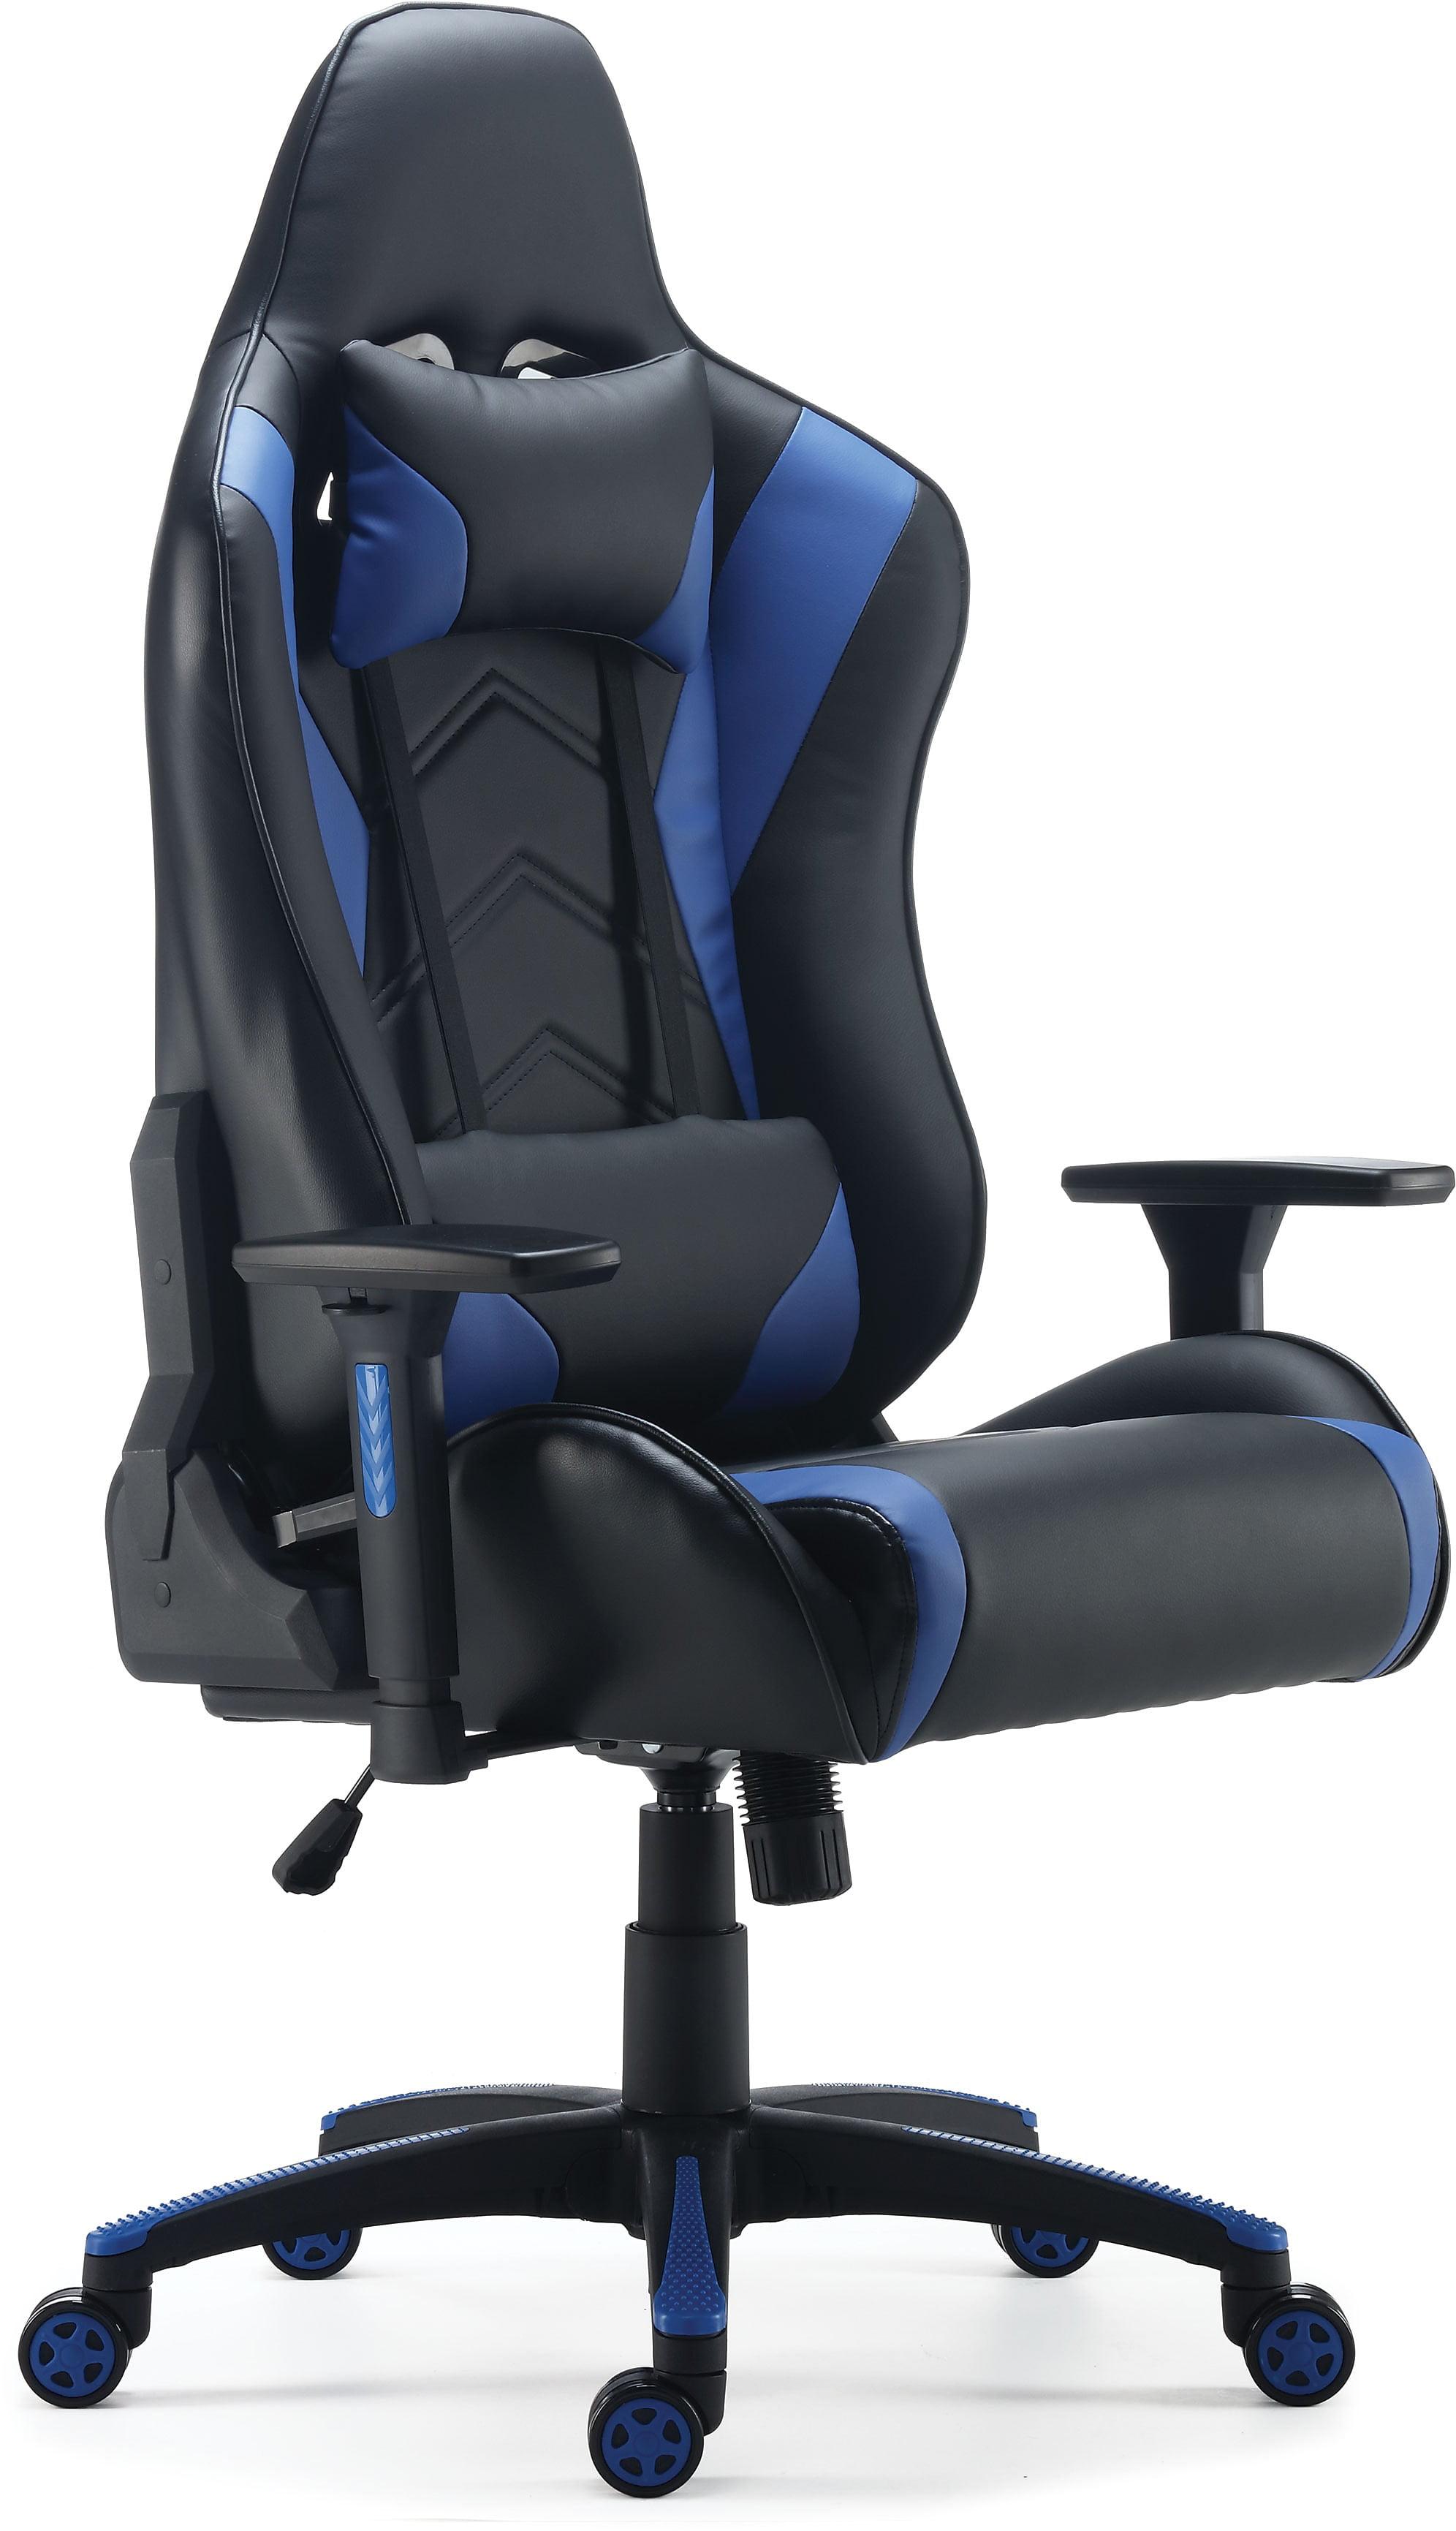 Staples Vartan Gaming Chair Blue 24326200 - Walmart.com - Walmart.com